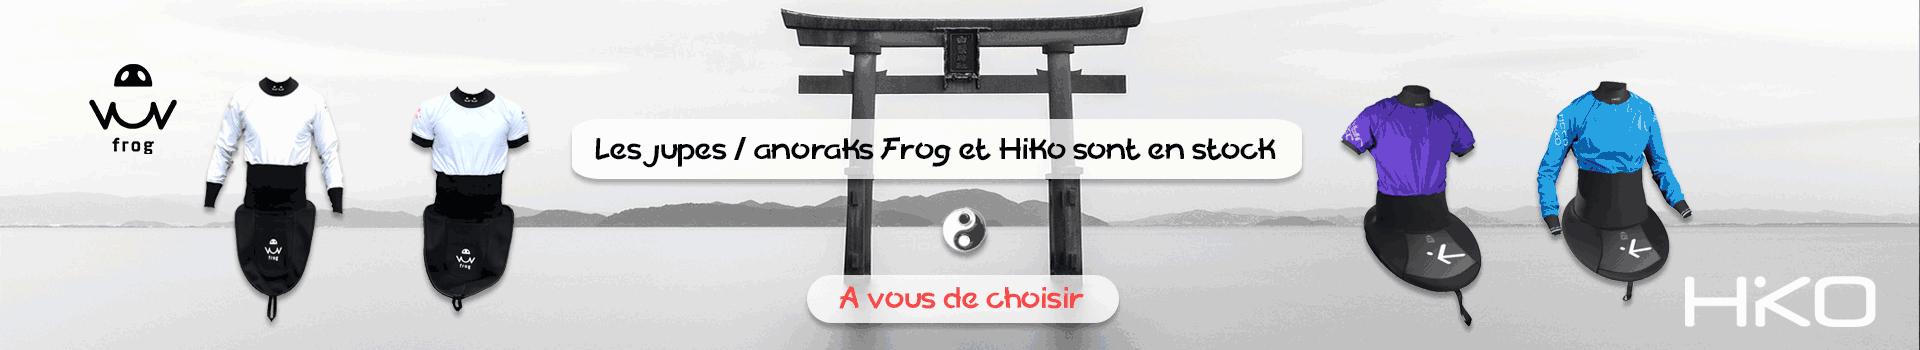 Jupes anoraks Frog & Hiko - A vous de choisir